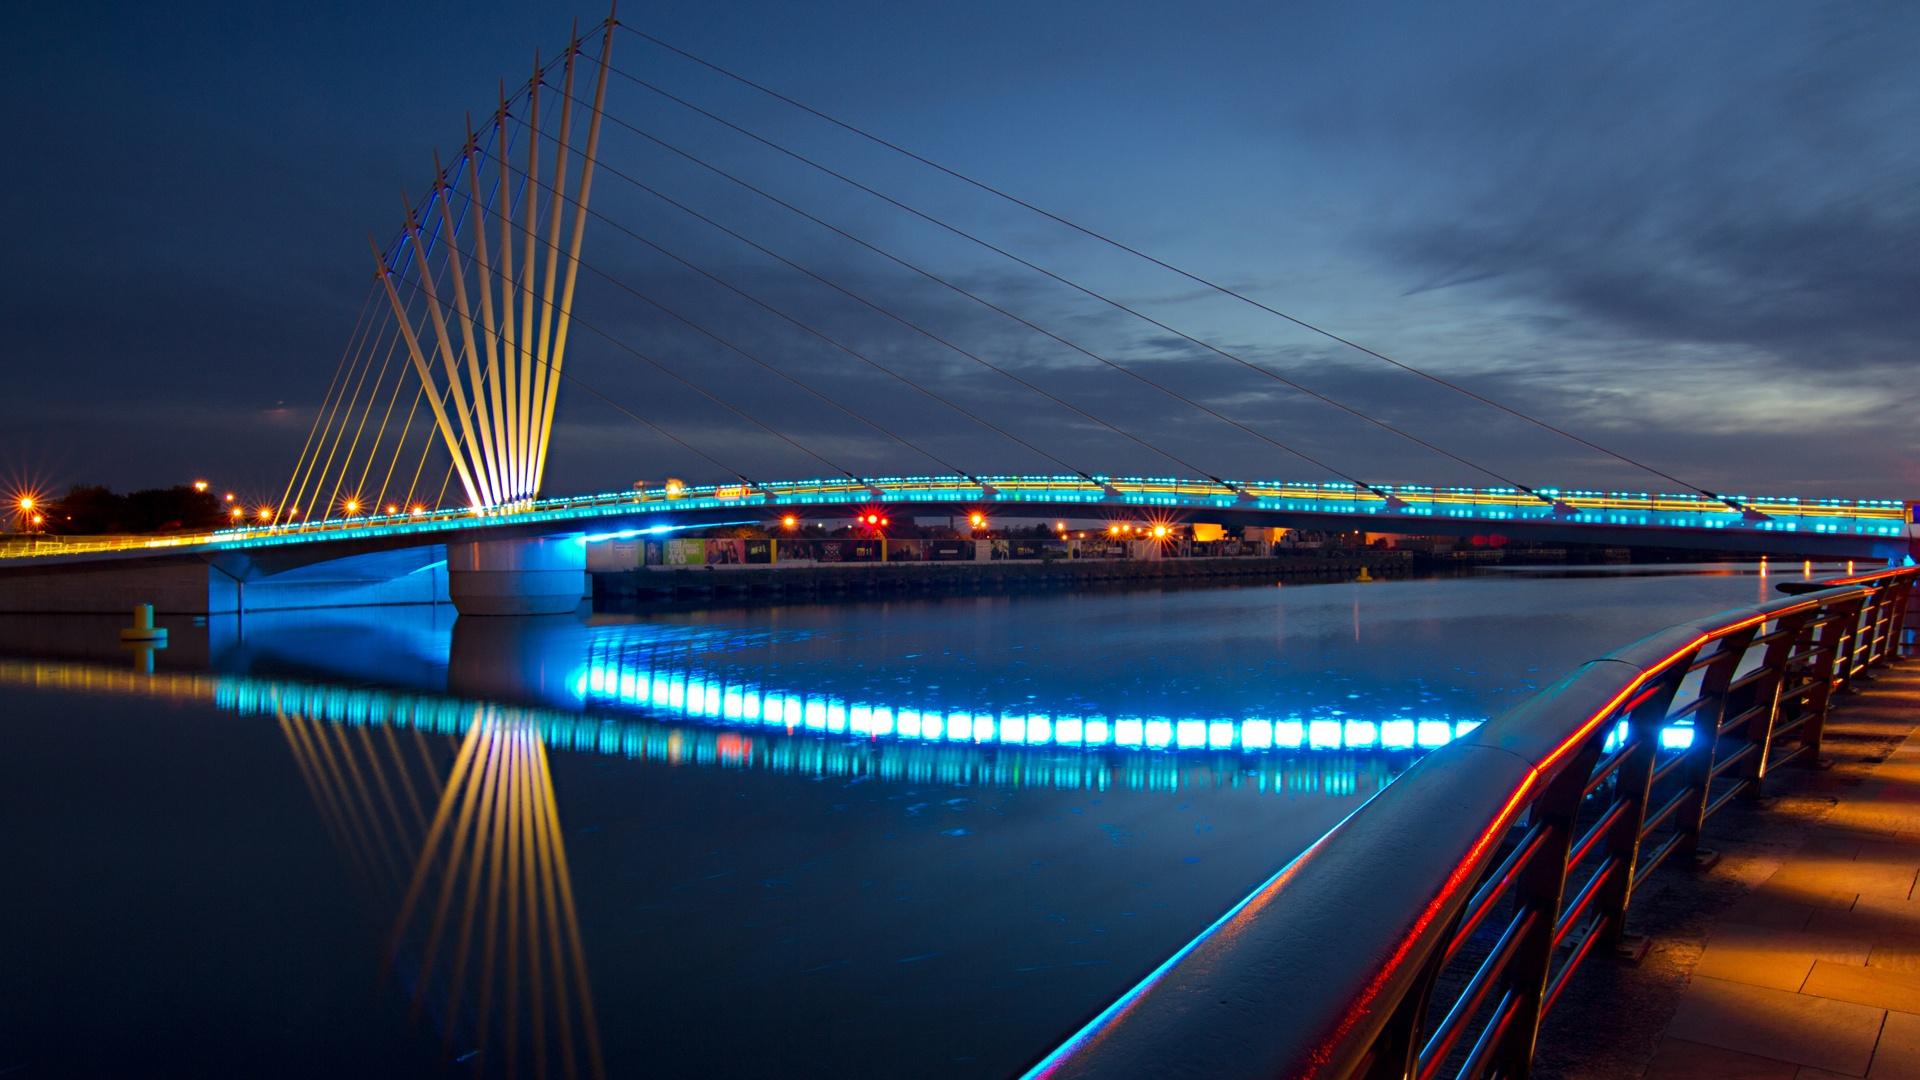 city-lights-and-bridges-City-Night-Bridge-Lights-The-Promenade-x-Download-wallpaper-wp3004376